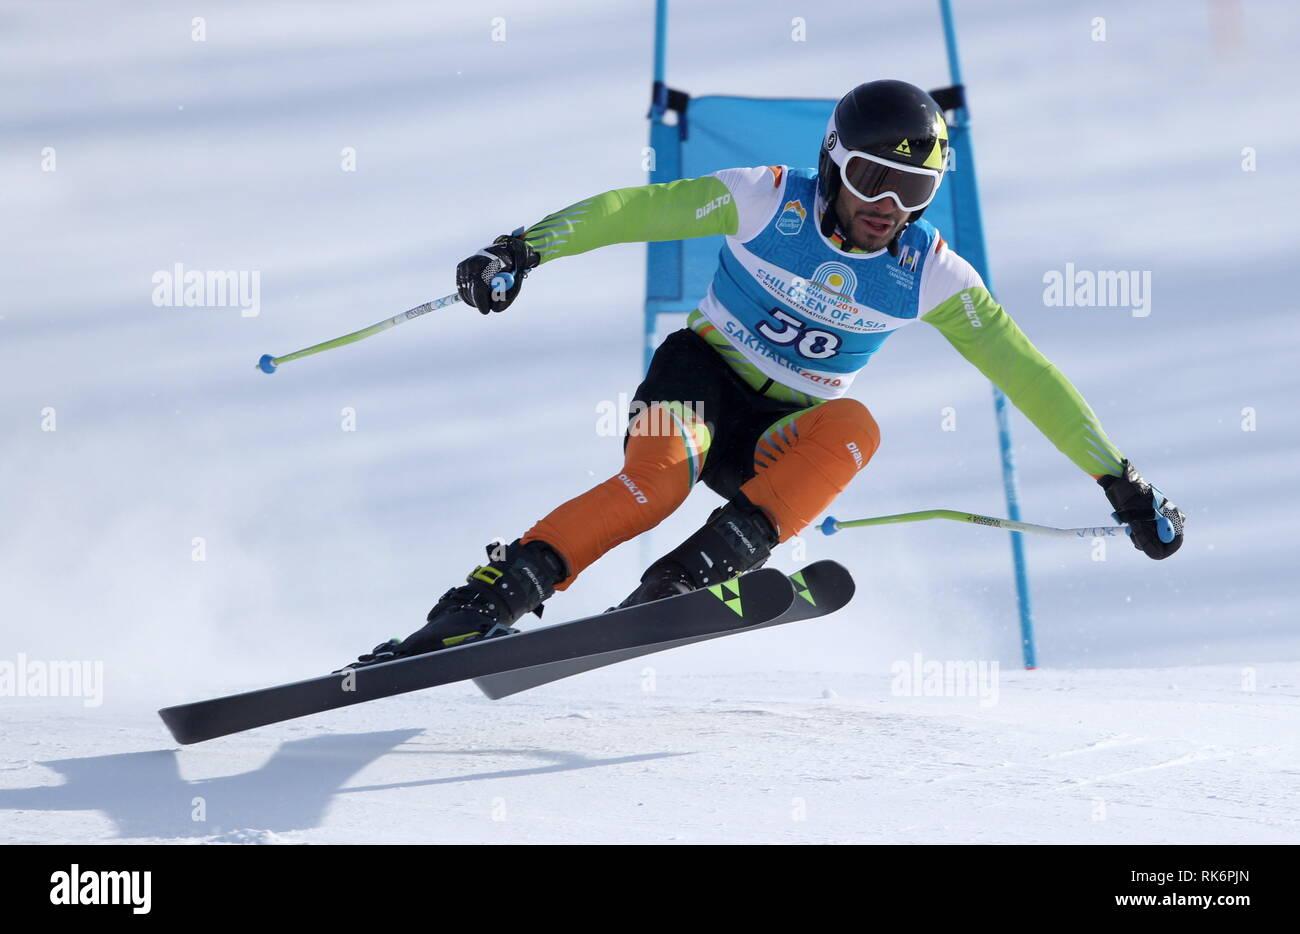 Yuzhno Sakhalinsk, Russia. 10th Feb, 2019. YUZHNO-SAKHALINSK, RUSSIA - FEBRUARY 10, 2019: India's Shaib Malik competes in the alpine skiing men's super giant slalom event at the 1st Children of Asia Winter International Sports Games. Andrei Golovanov/TASS Credit: ITAR-TASS News Agency/Alamy Live News - Stock Image